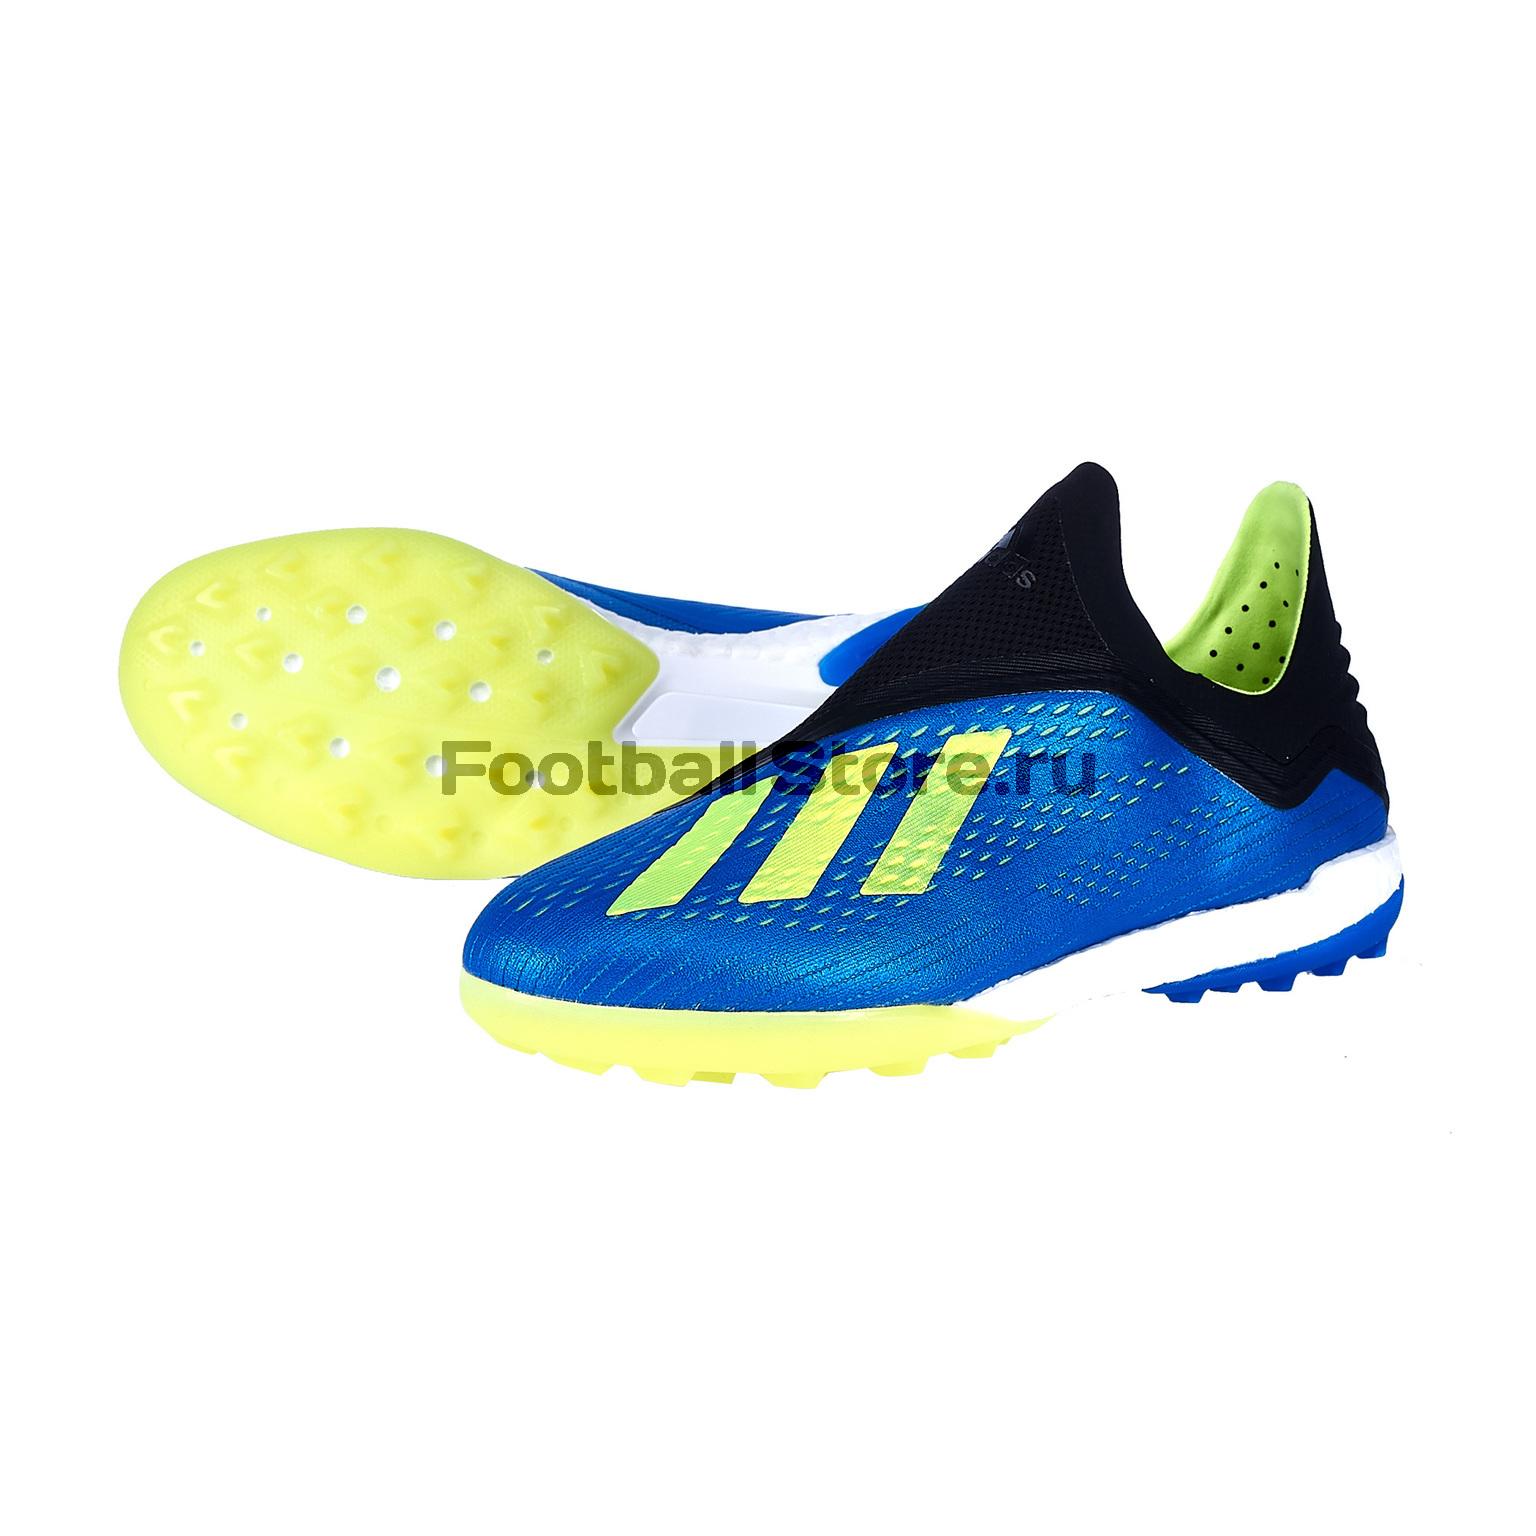 Шиповки Adidas X Tango 18+ TF BB6595